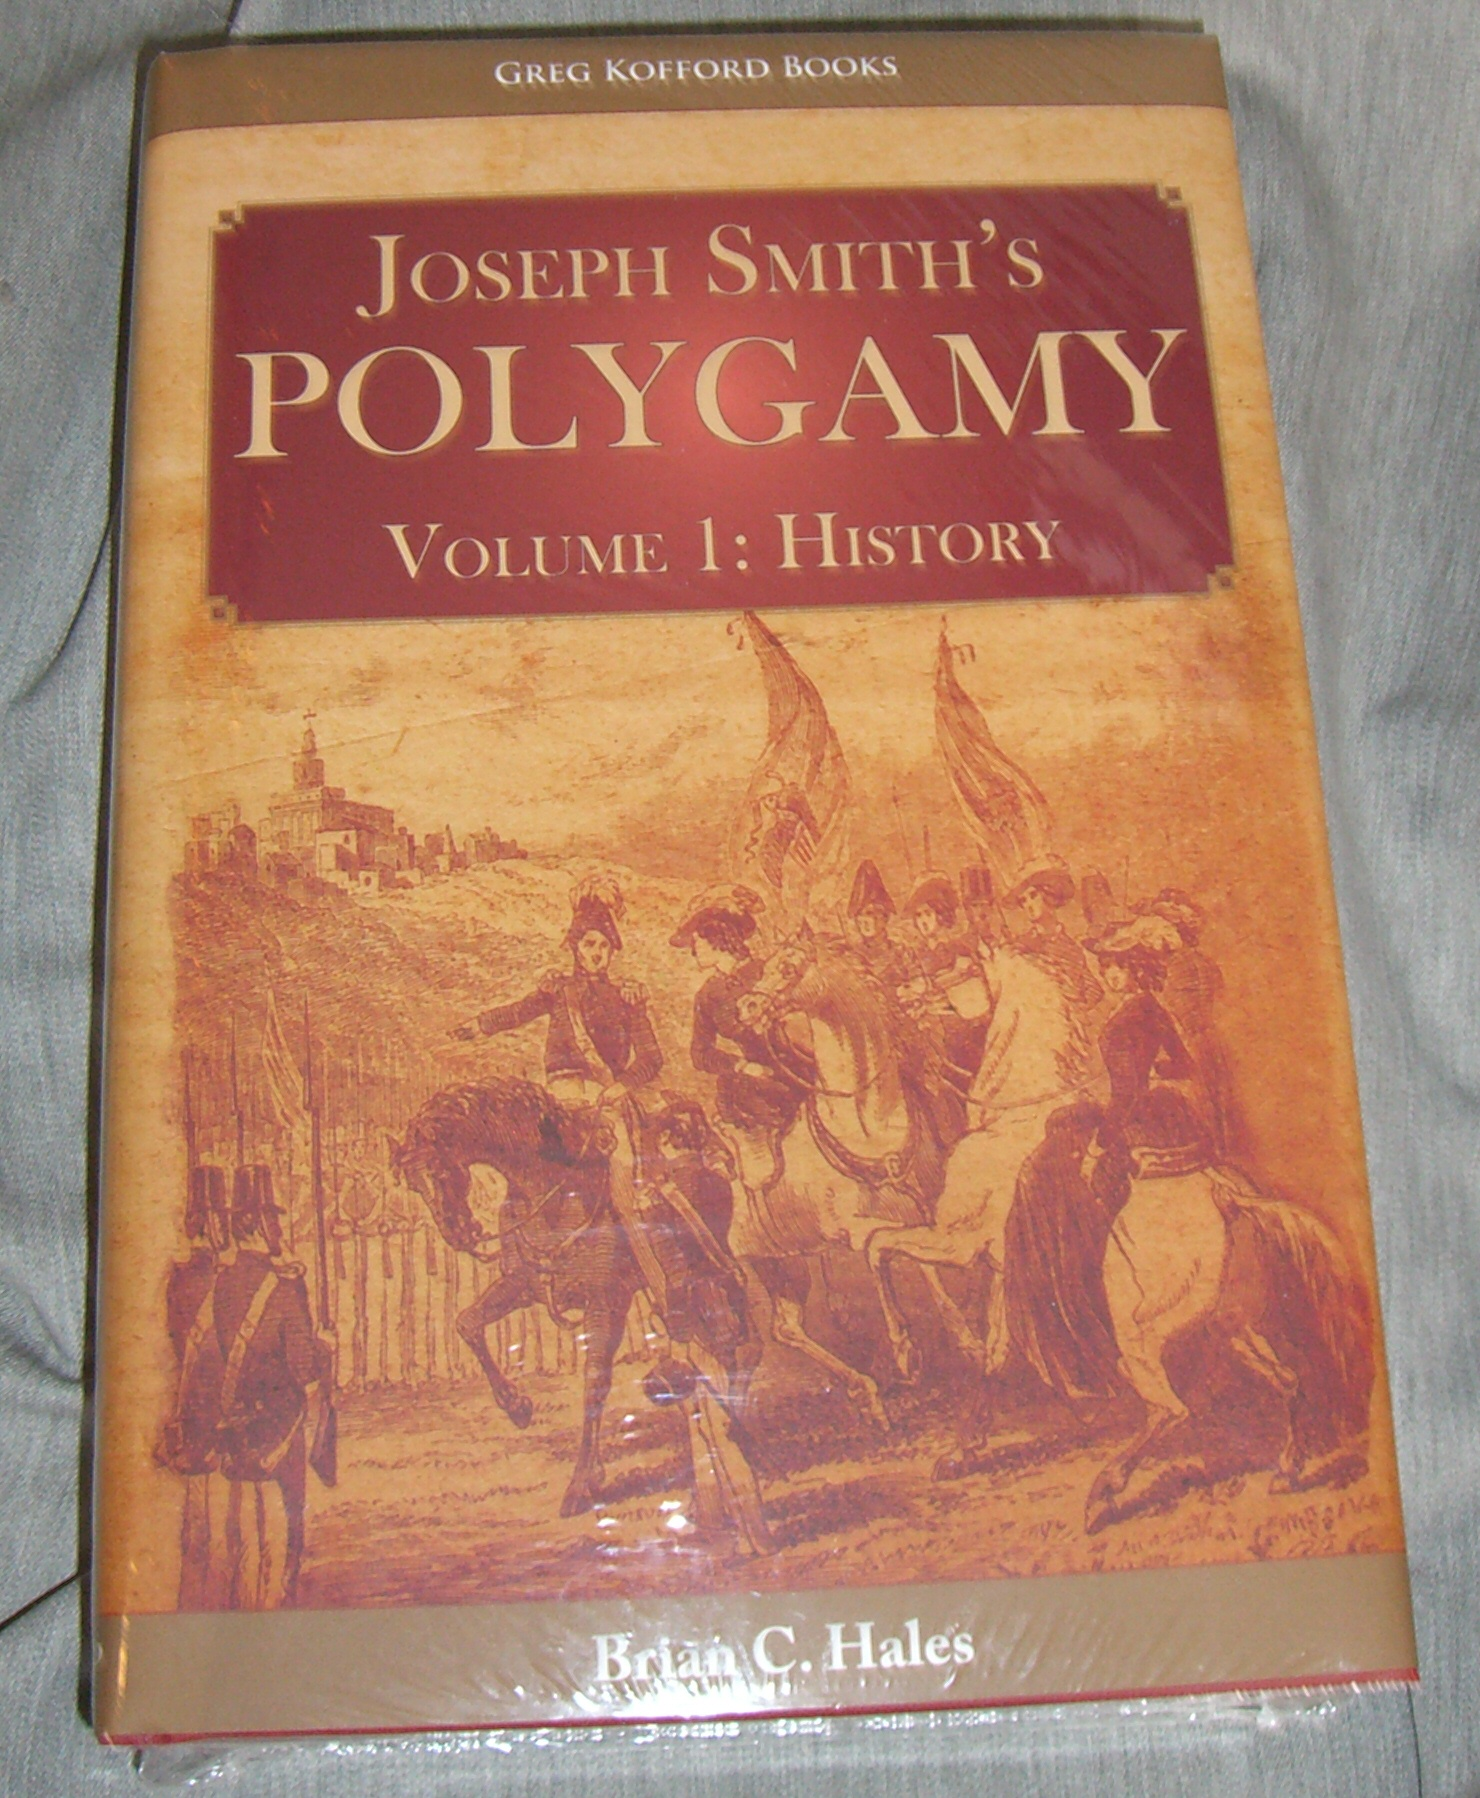 Joseph Smith's Polygamy, Volume 1 - History, Hales, Brian C.